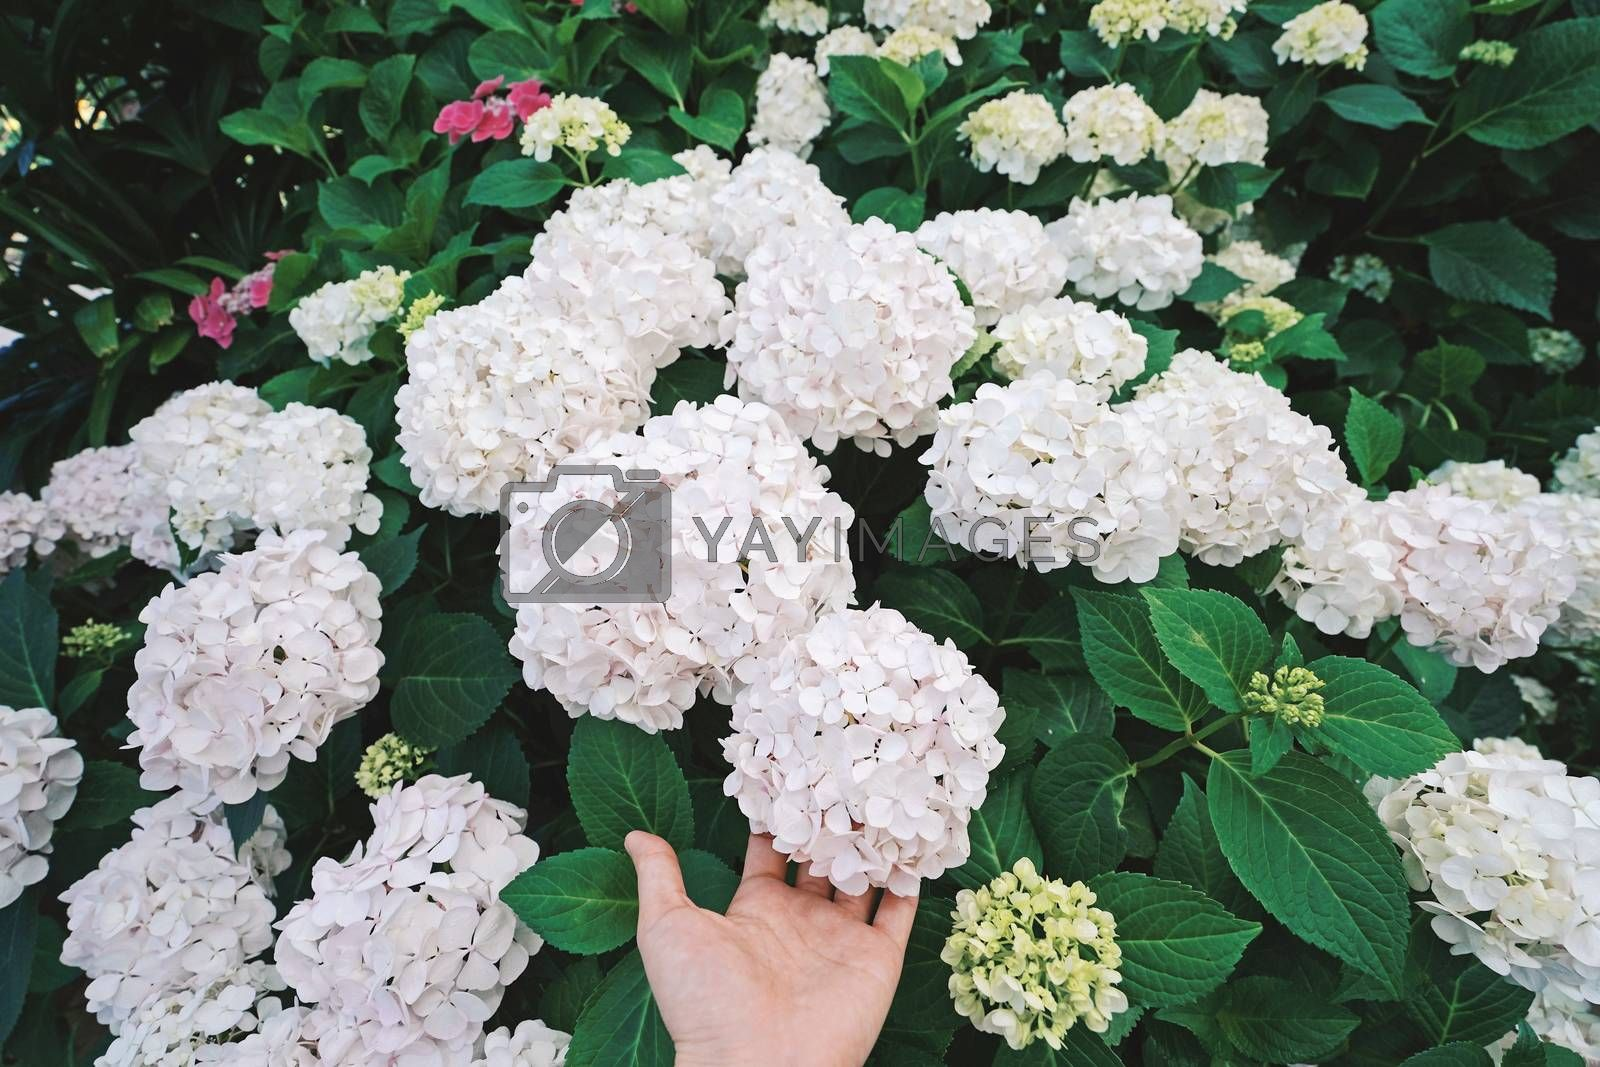 Hand holding beautiful hydrangea bloom in the garden